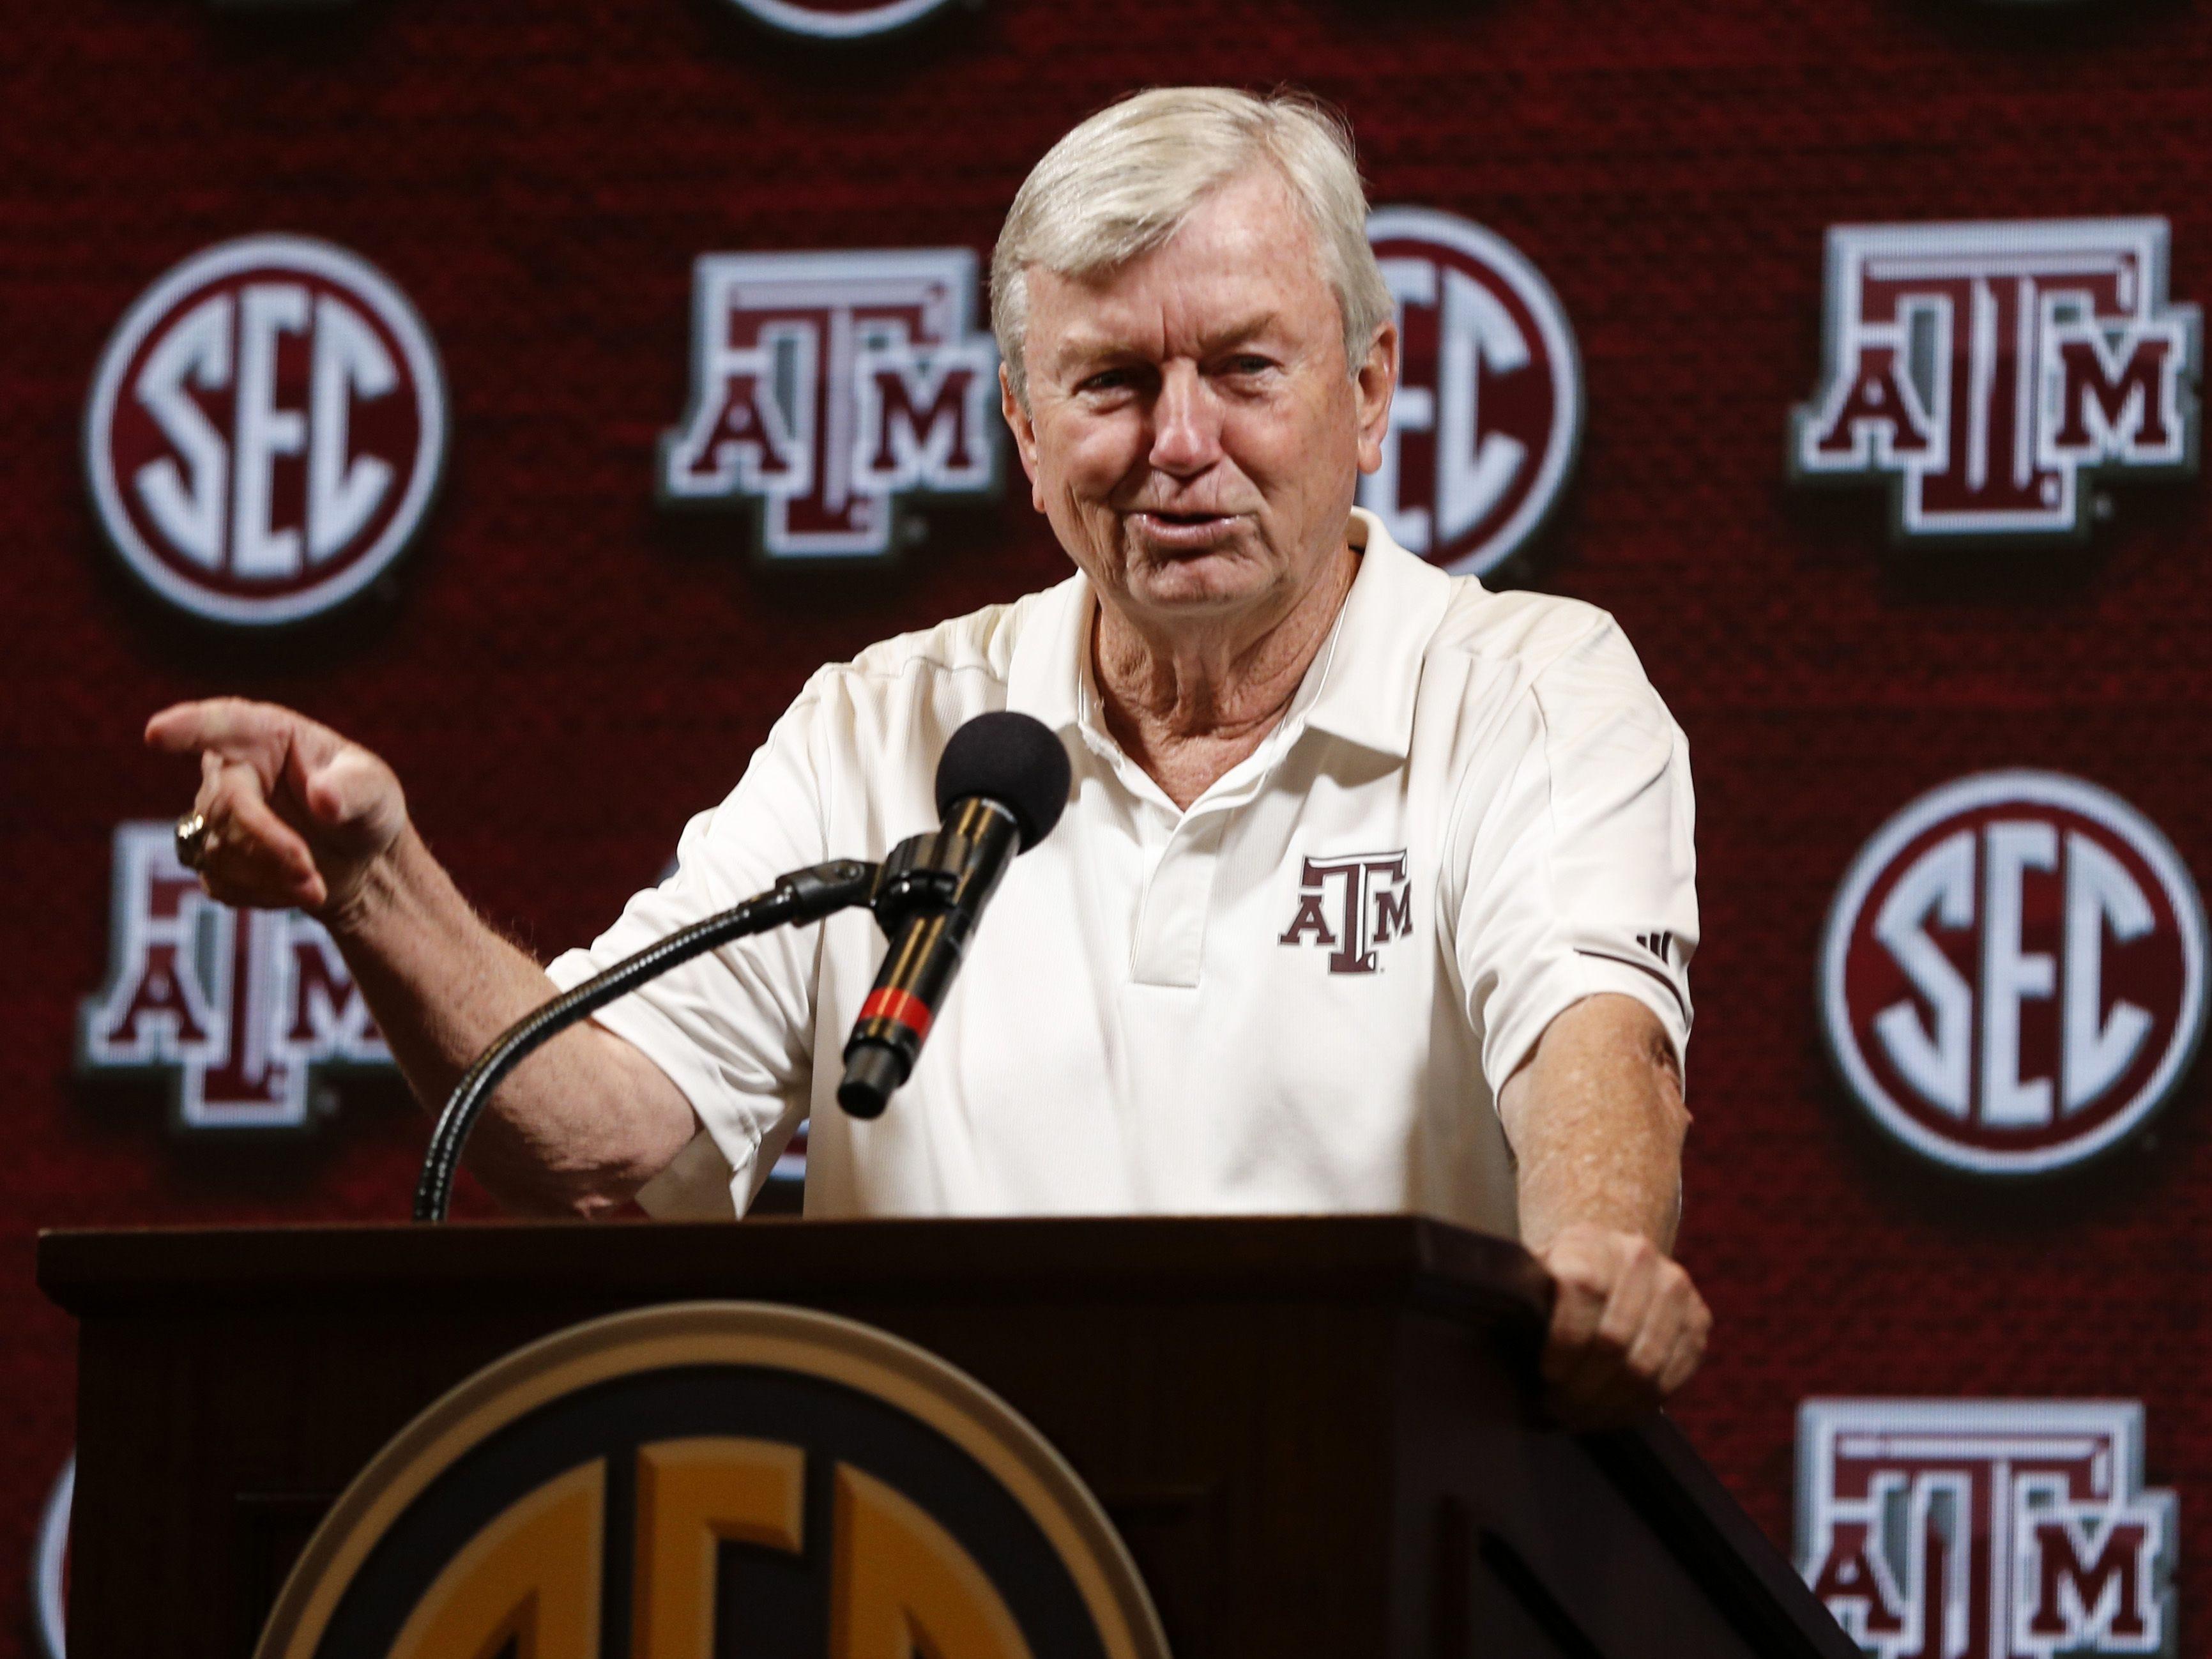 SEC coaches select Texas A&M as women's basketball favorite   USA TODAY Sports